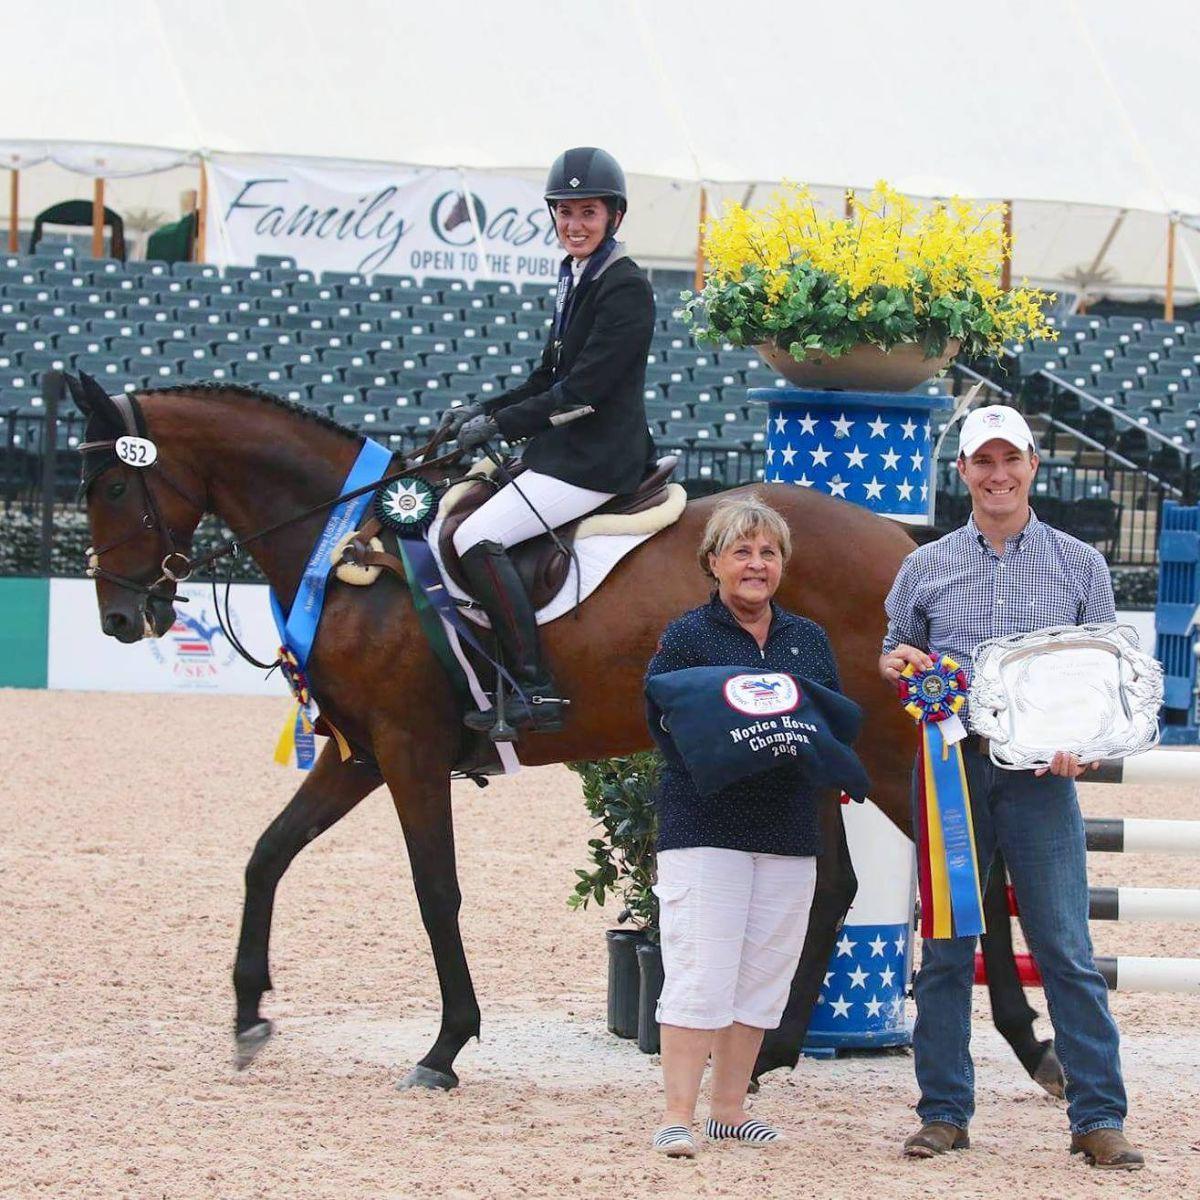 Ashley Phillips and Bayani Slade, 2016 AEC Novice Horse champions. Photo by Ryan Hall.